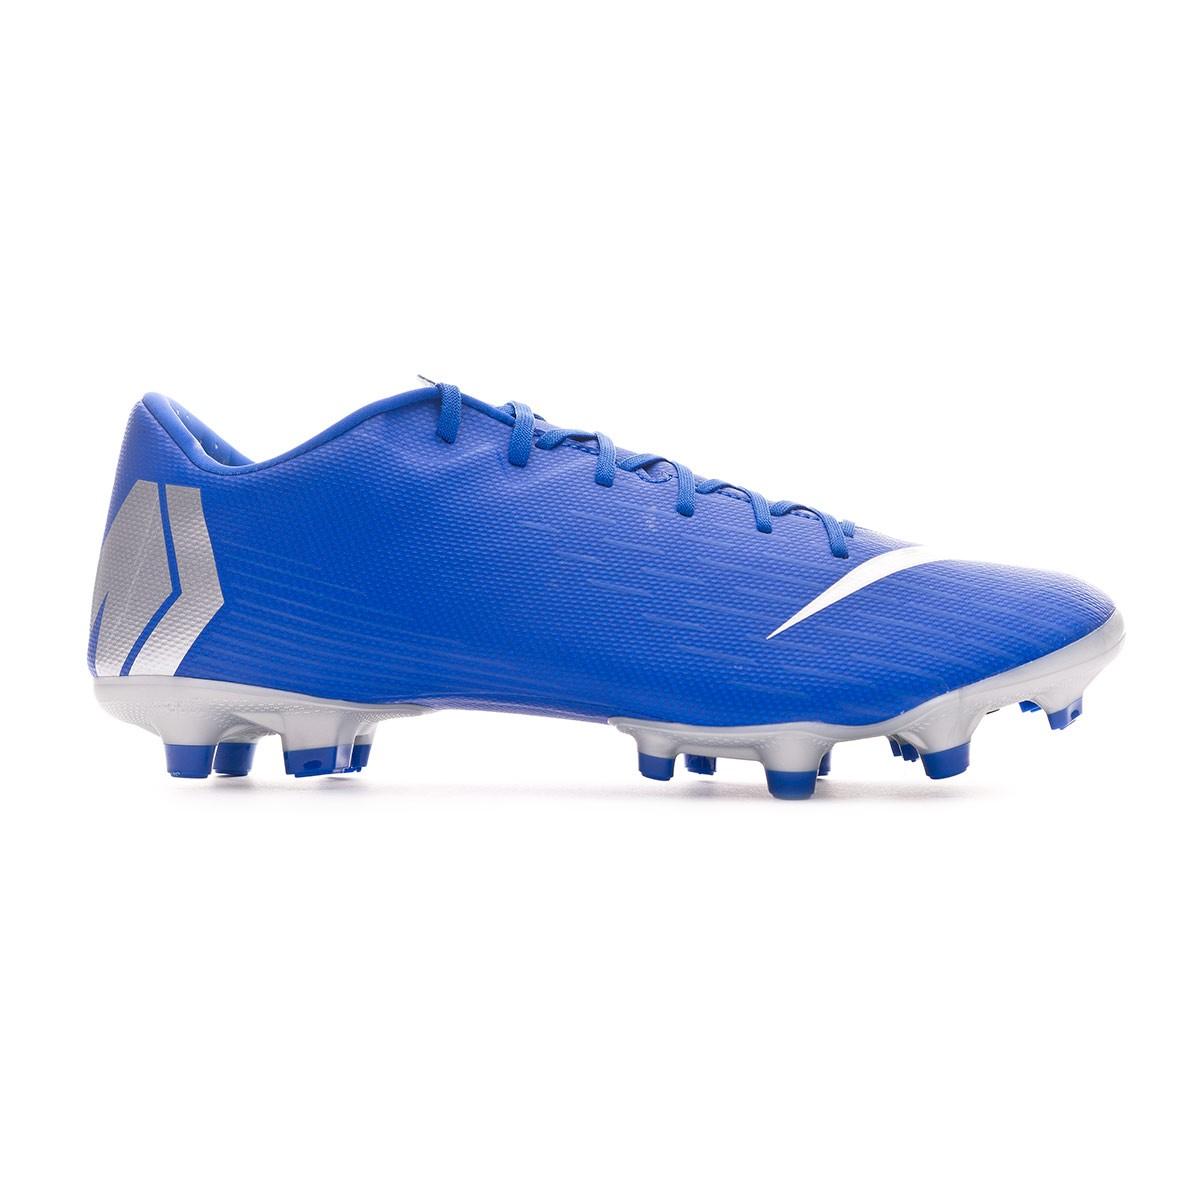 abd7fd27e8a Football Boots Nike Mercurial Vapor XII Academy MG Racer blue-Metallic  silver-Black-Volt - Nike Mercurial Superfly